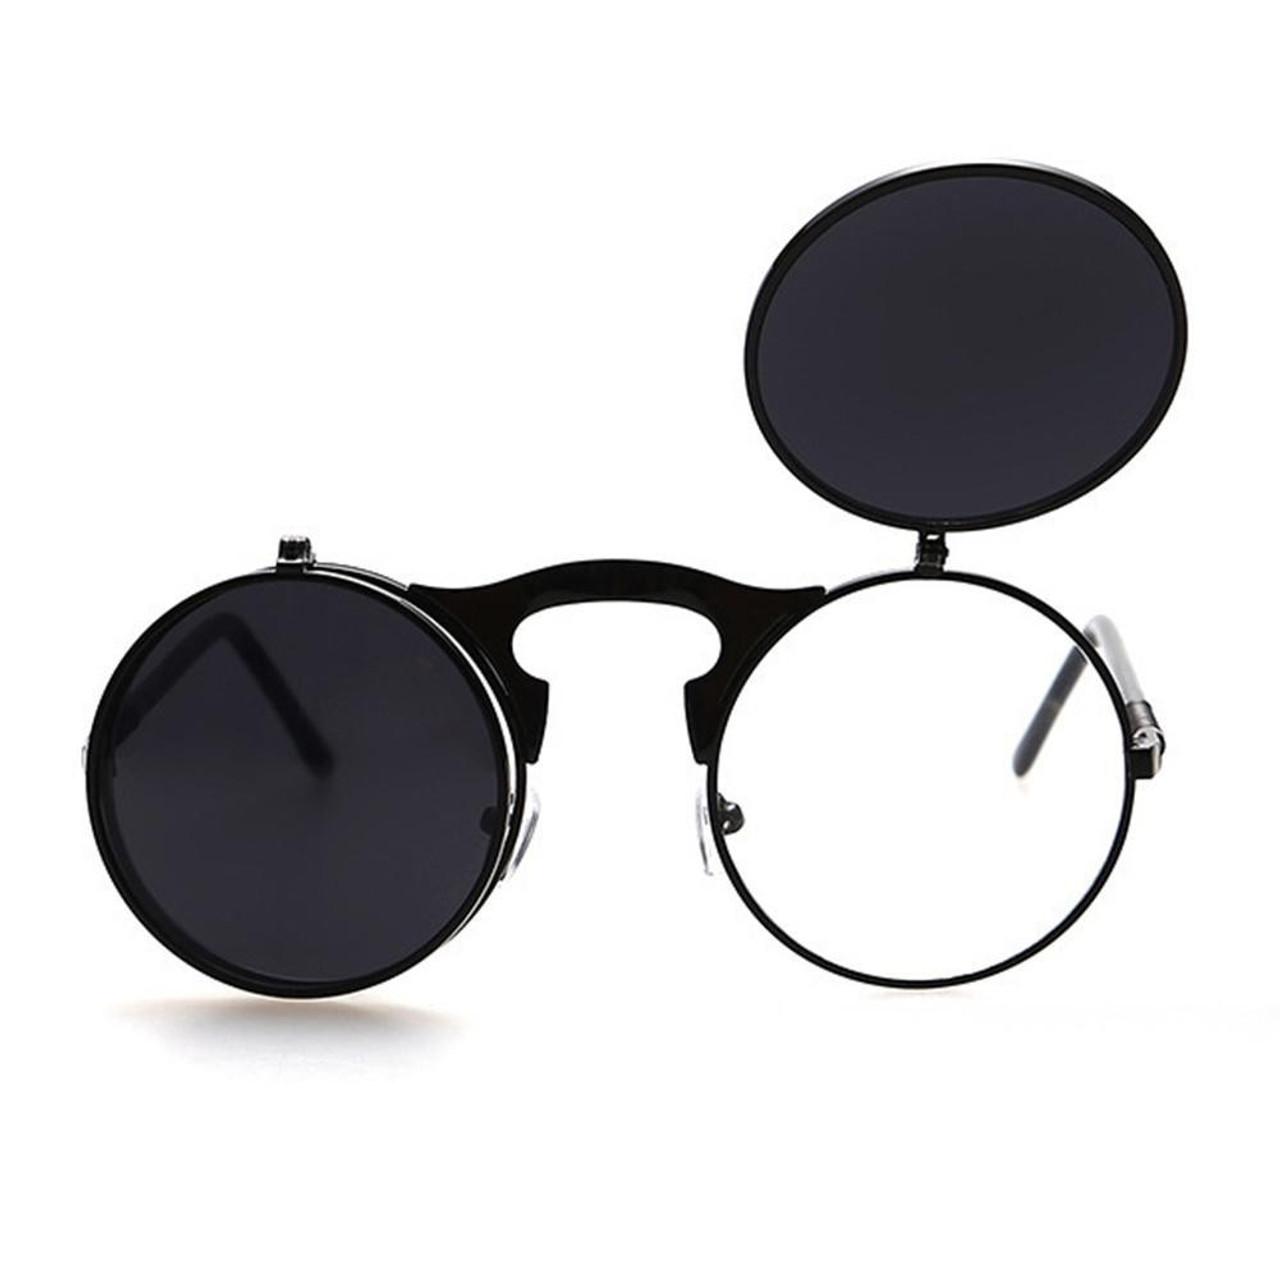 adbe06dac9 ... men vintage round steampunk sunglasses men small round flip up sunglasses  women retro metal silver cheap ...